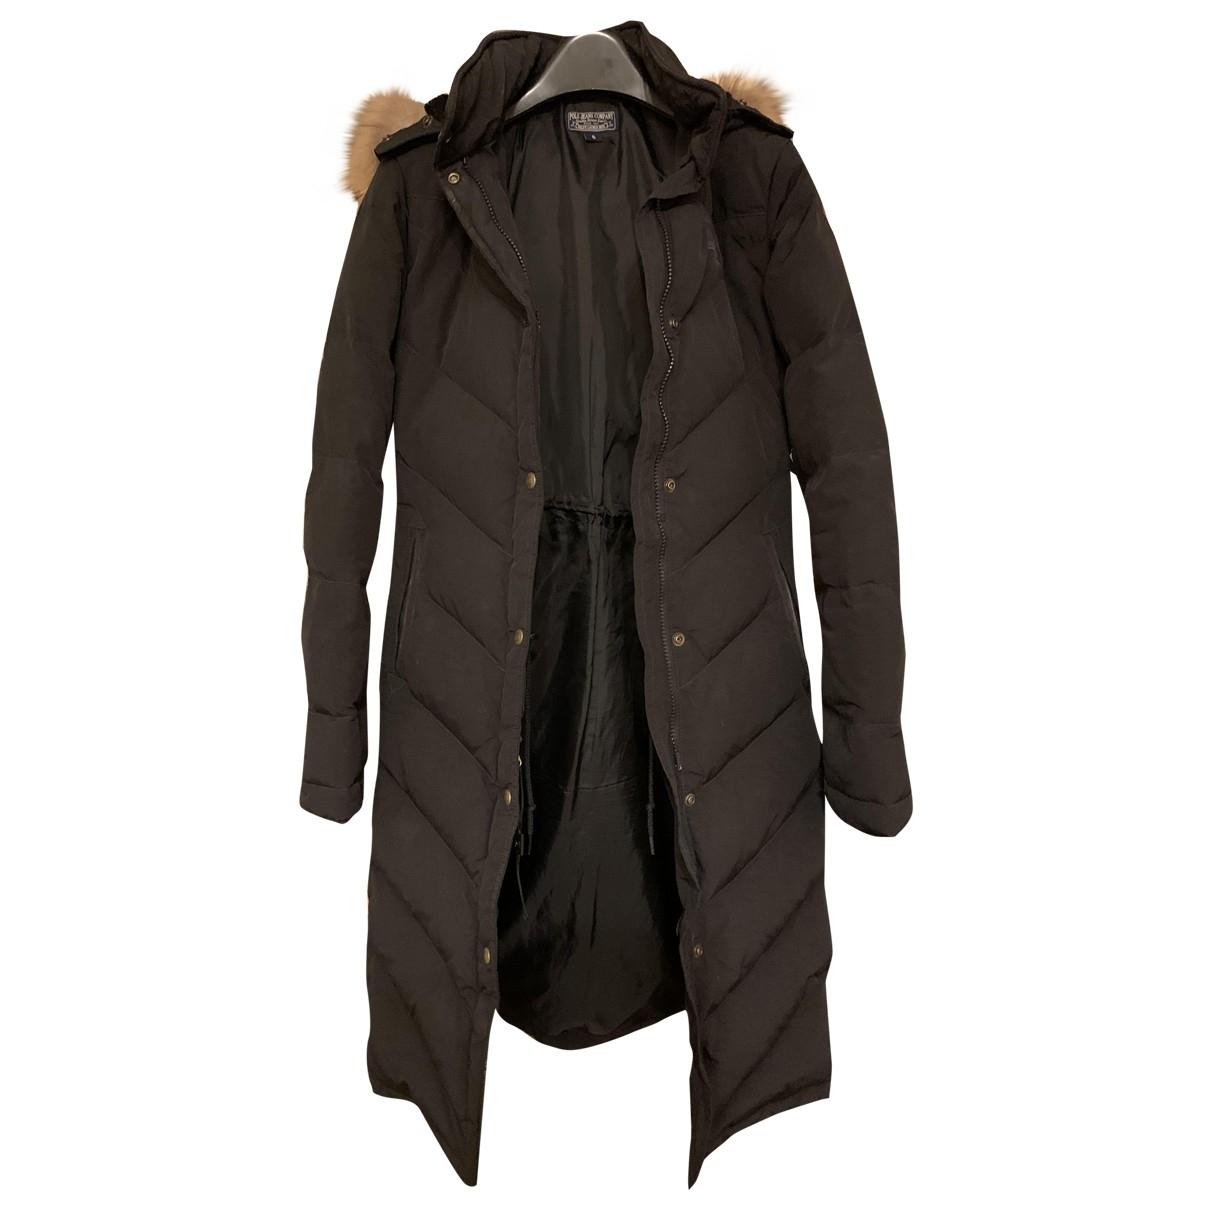 Ralph Lauren \N Black coat for Women S International